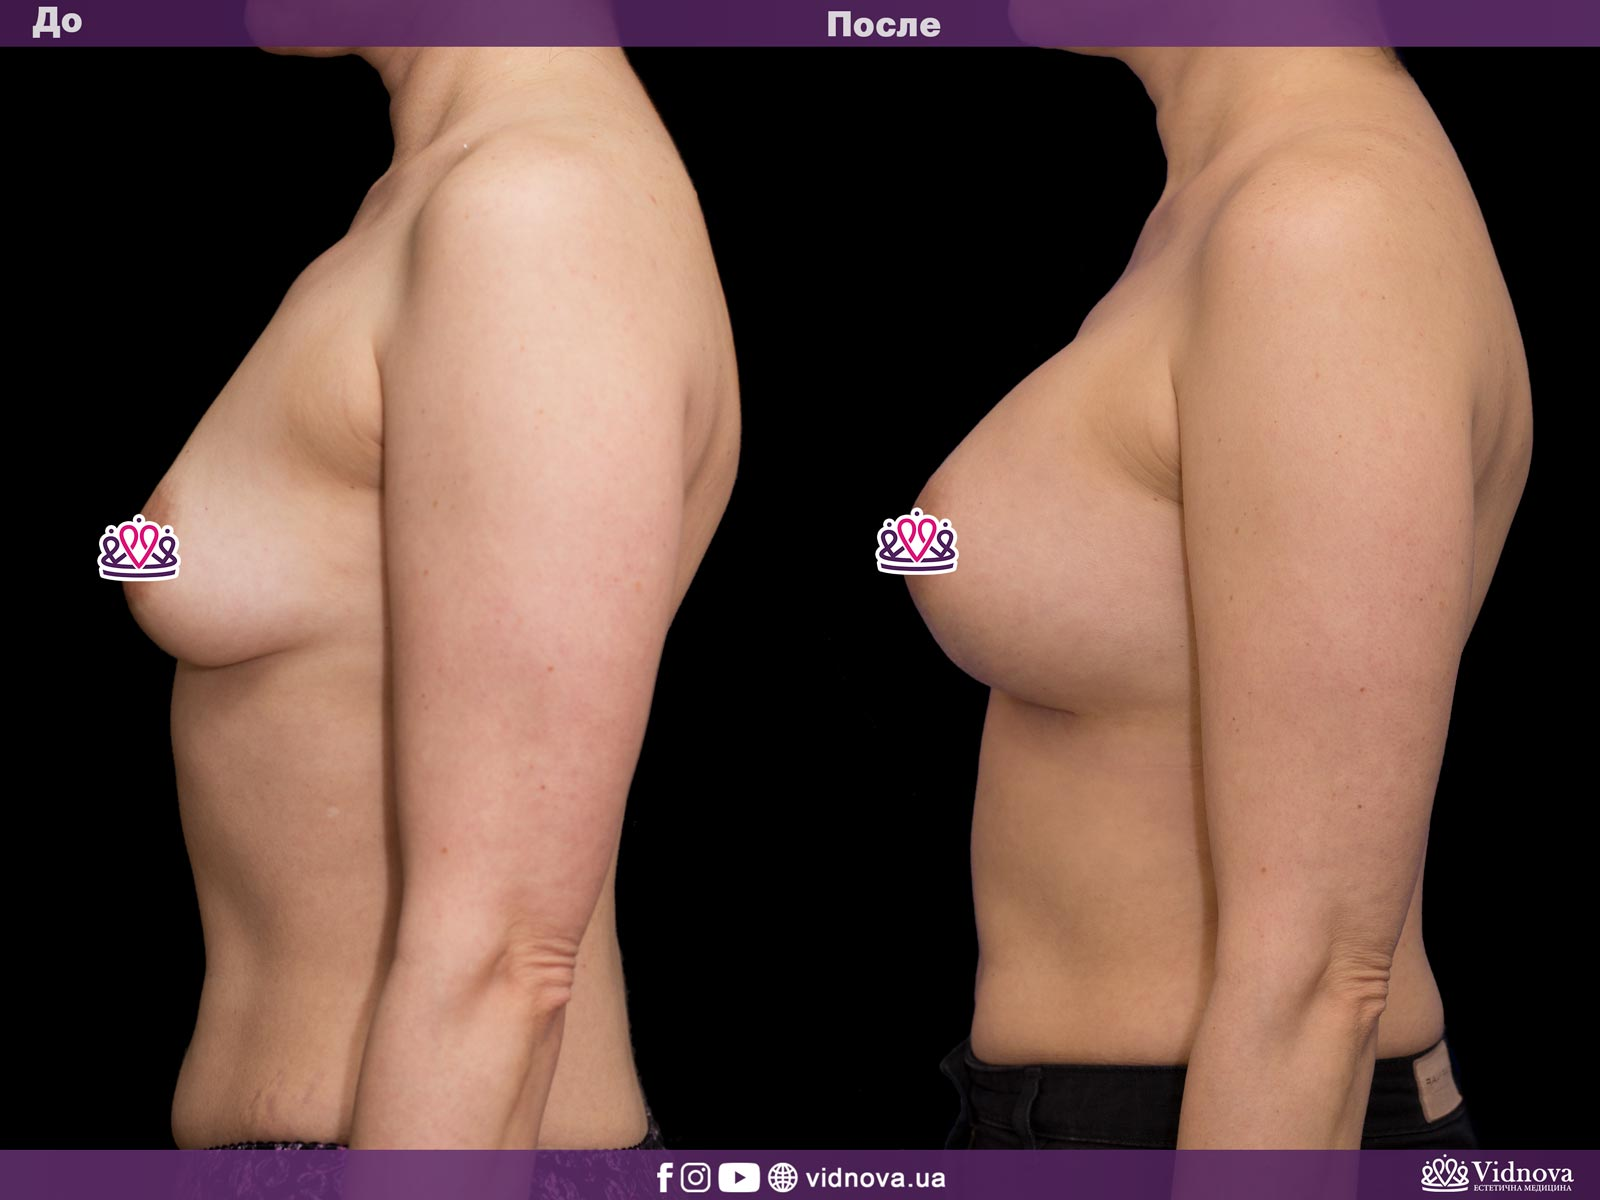 Увеличение груди: Фото ДО и ПОСЛЕ - Пример №30-3 - Клиника Vidnova